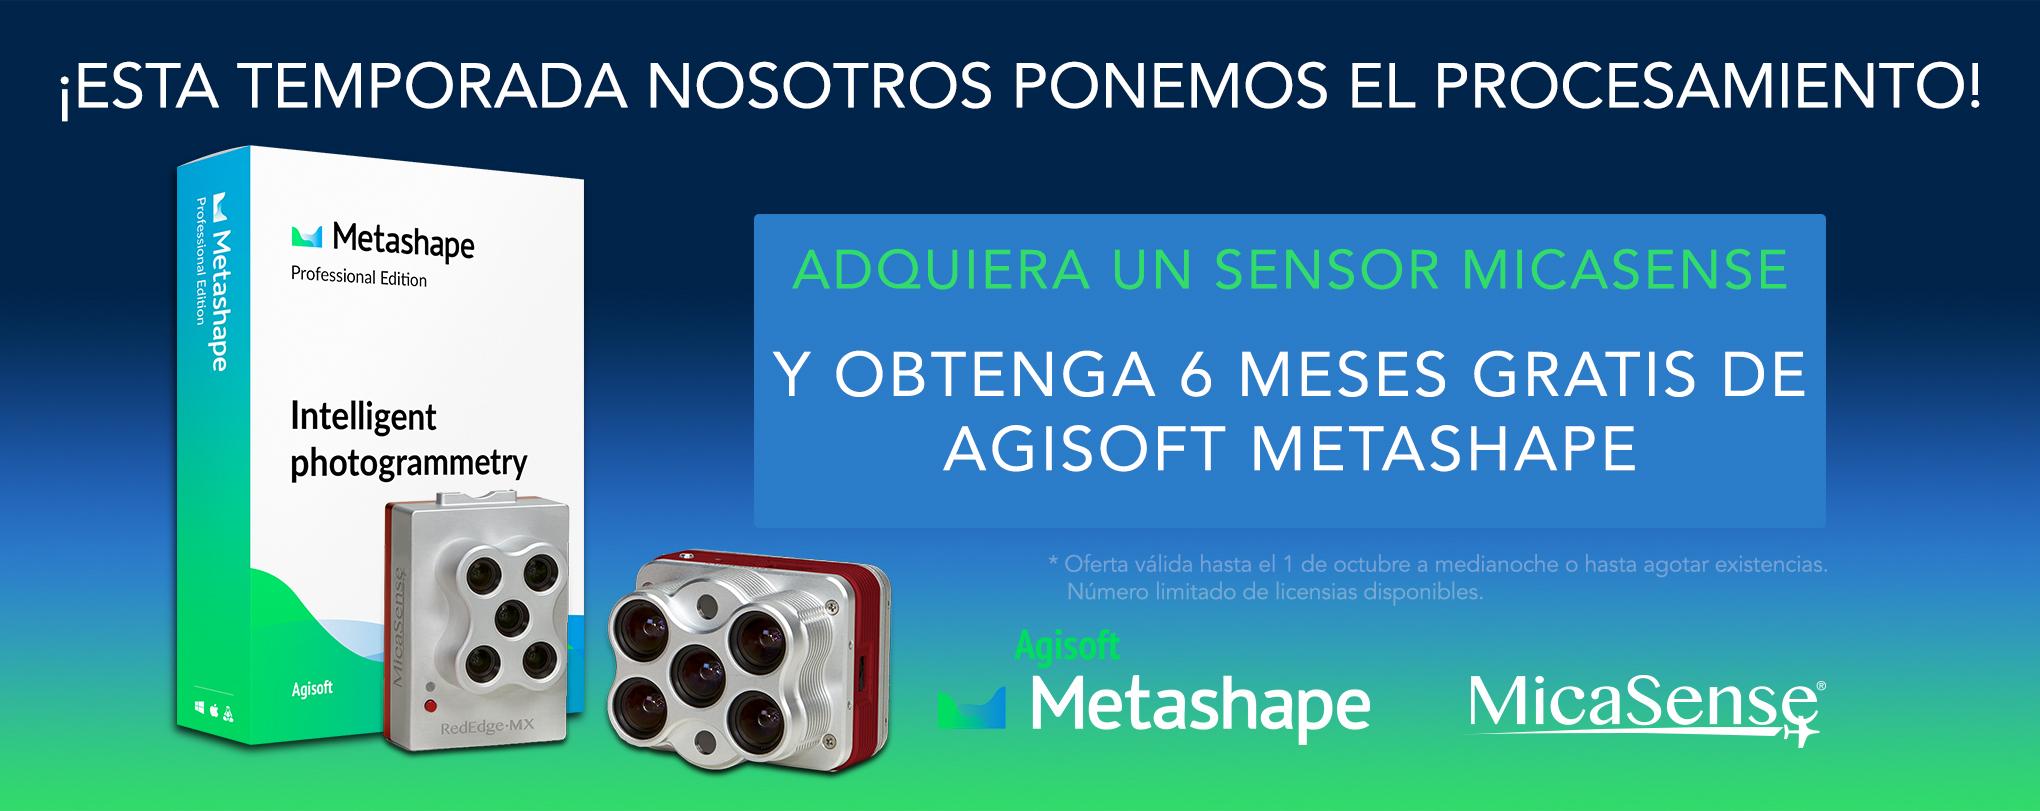 Web Banner Spanish.jpg